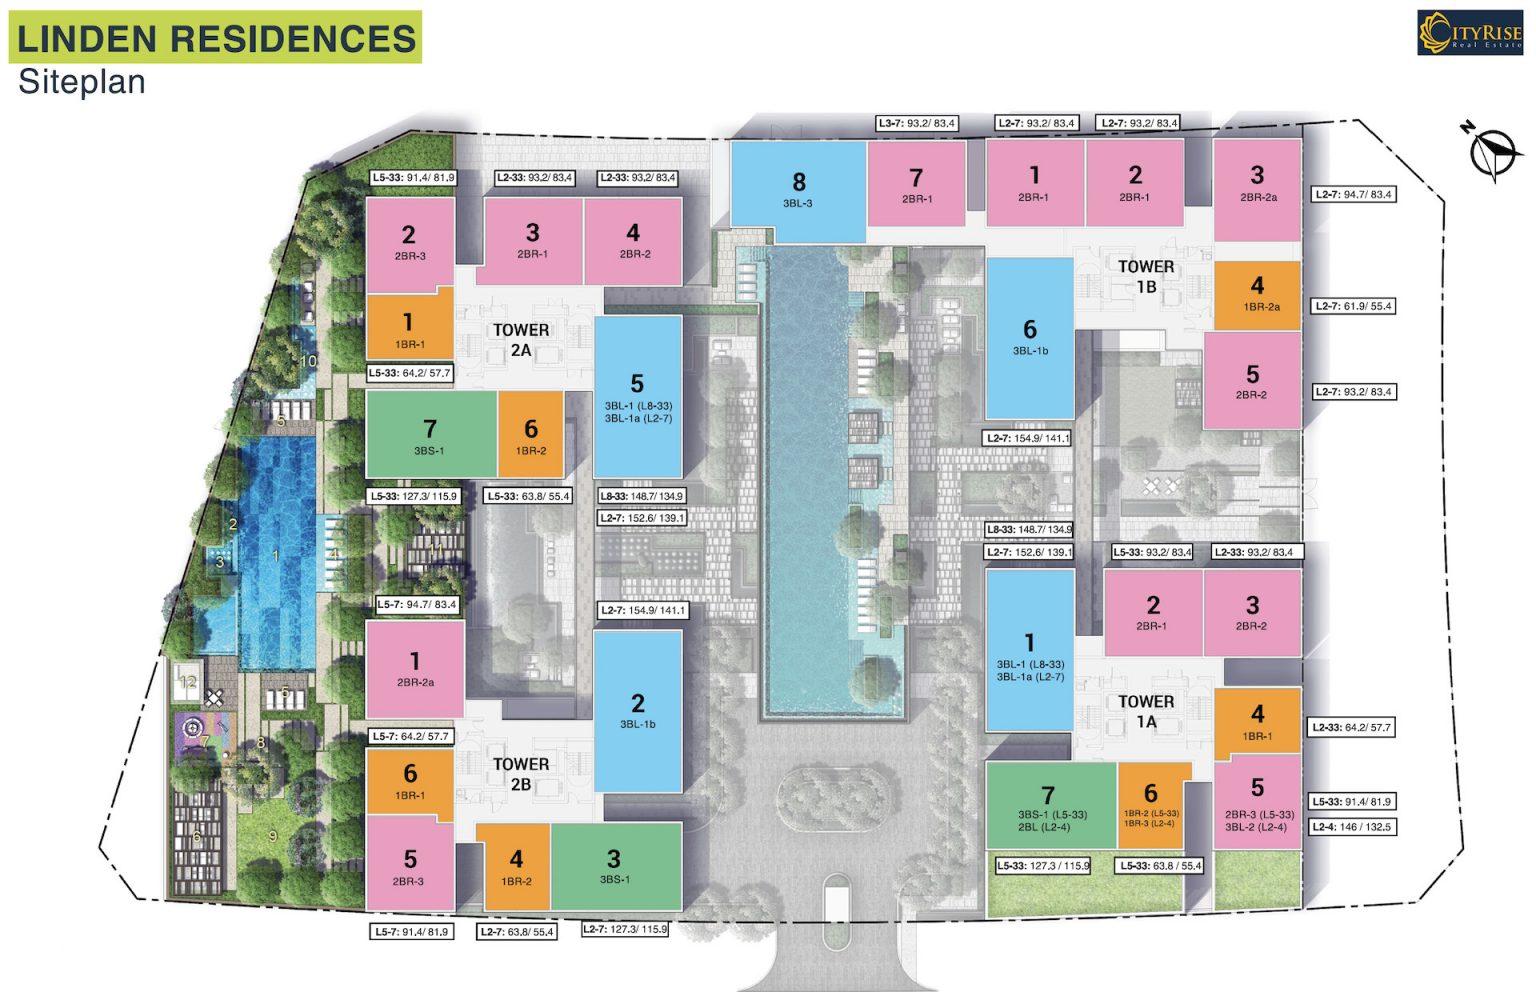 mat-bang-can-ho-linden-residences-empire-city-quan-2-1536x992